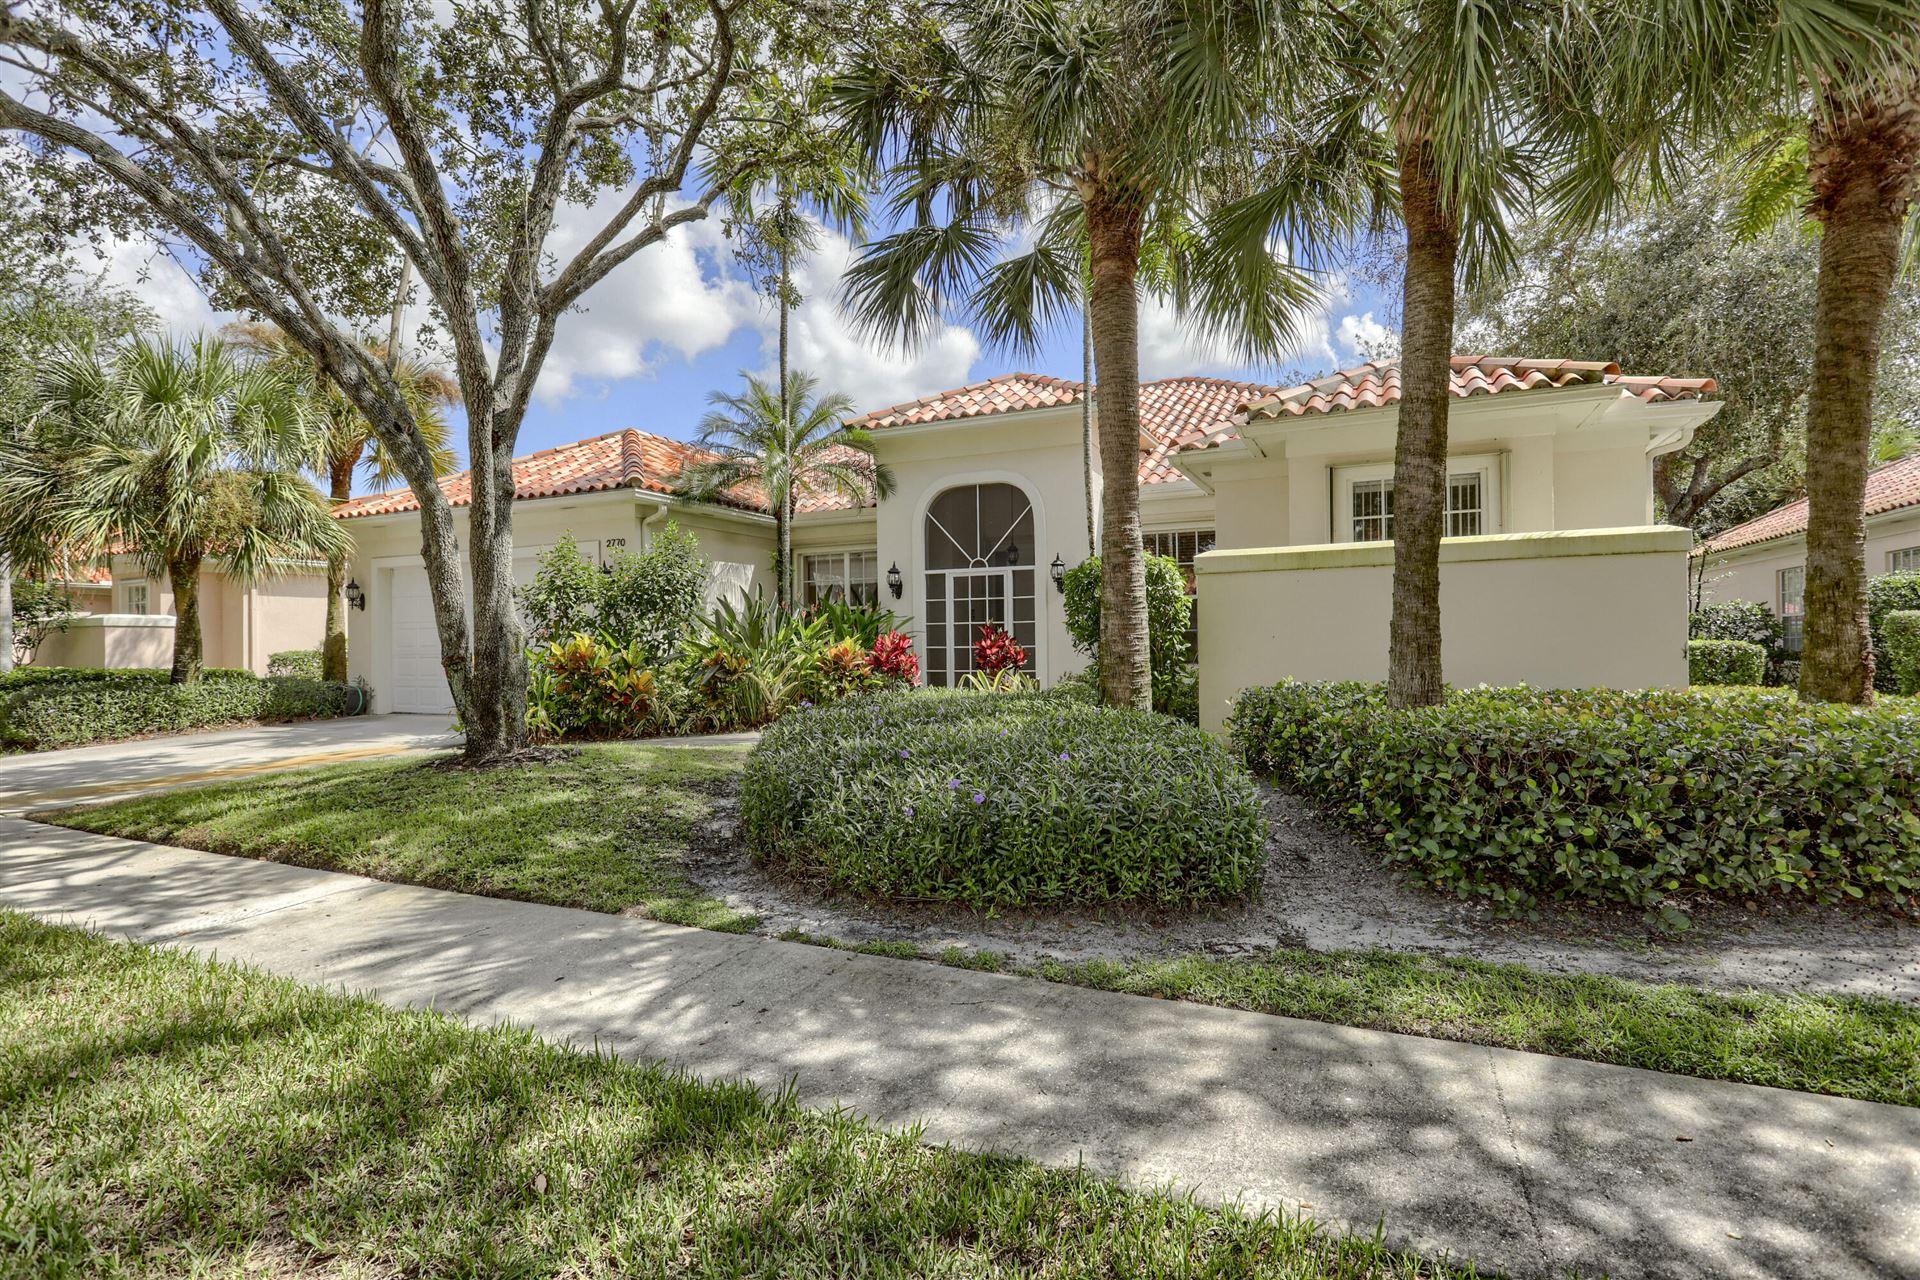 2770 Hancock Creek Road, West Palm Beach, FL 33411 - MLS#: RX-10746847